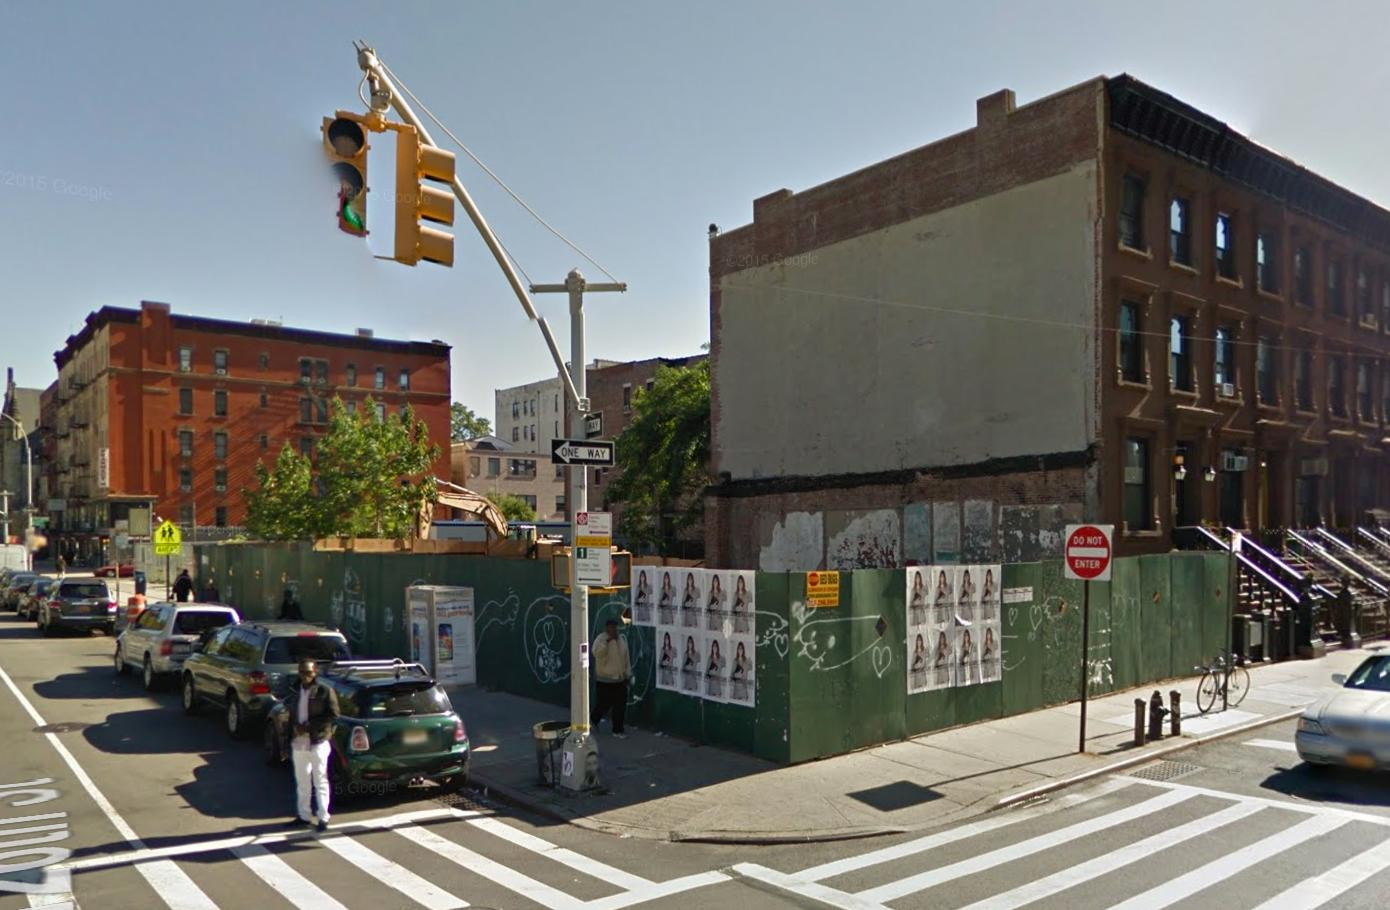 181 West 126th Street